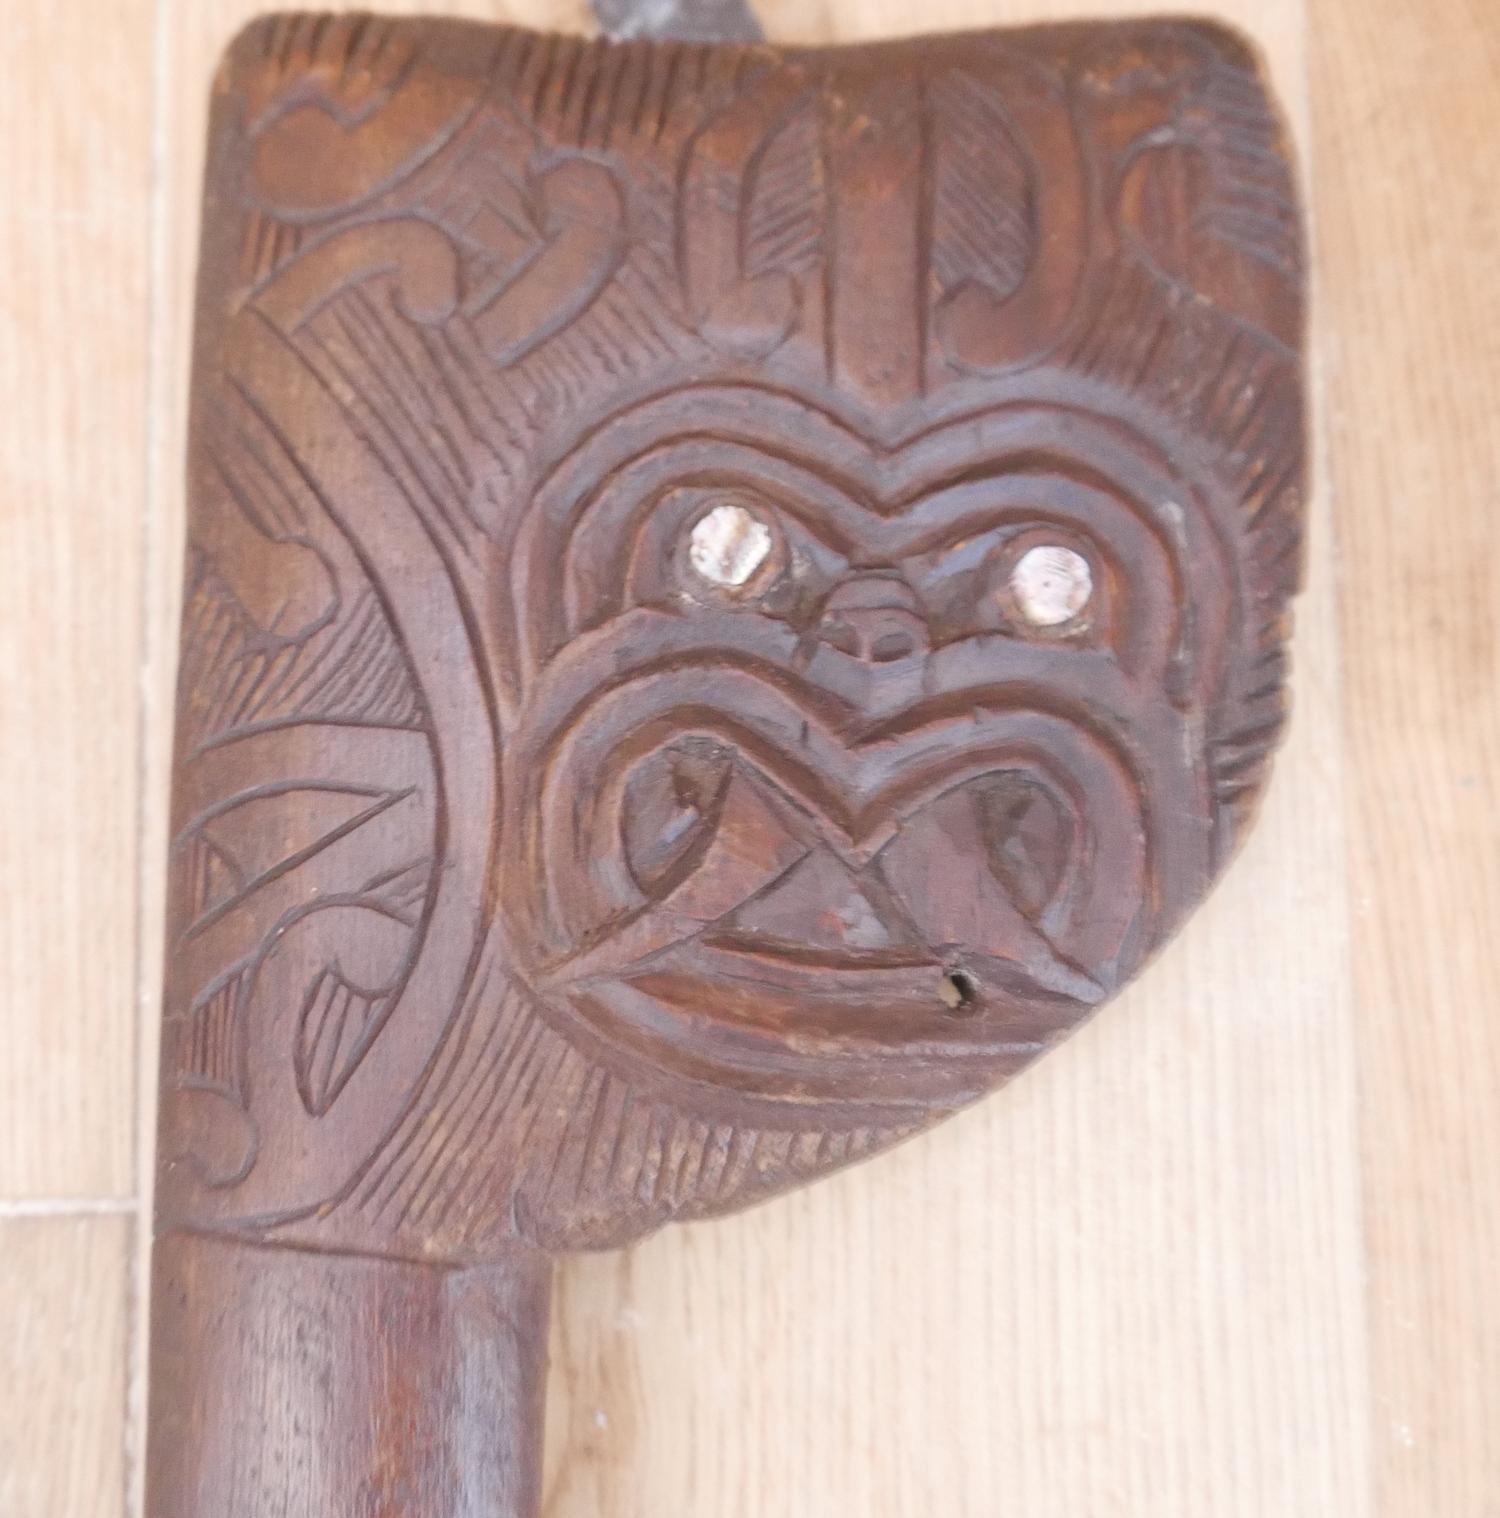 "Lot 75 - Maori Tribal Tewhatewha Staff - 47 1/2"" (121cm) tall with a 6"" x 5 1/2"" head."